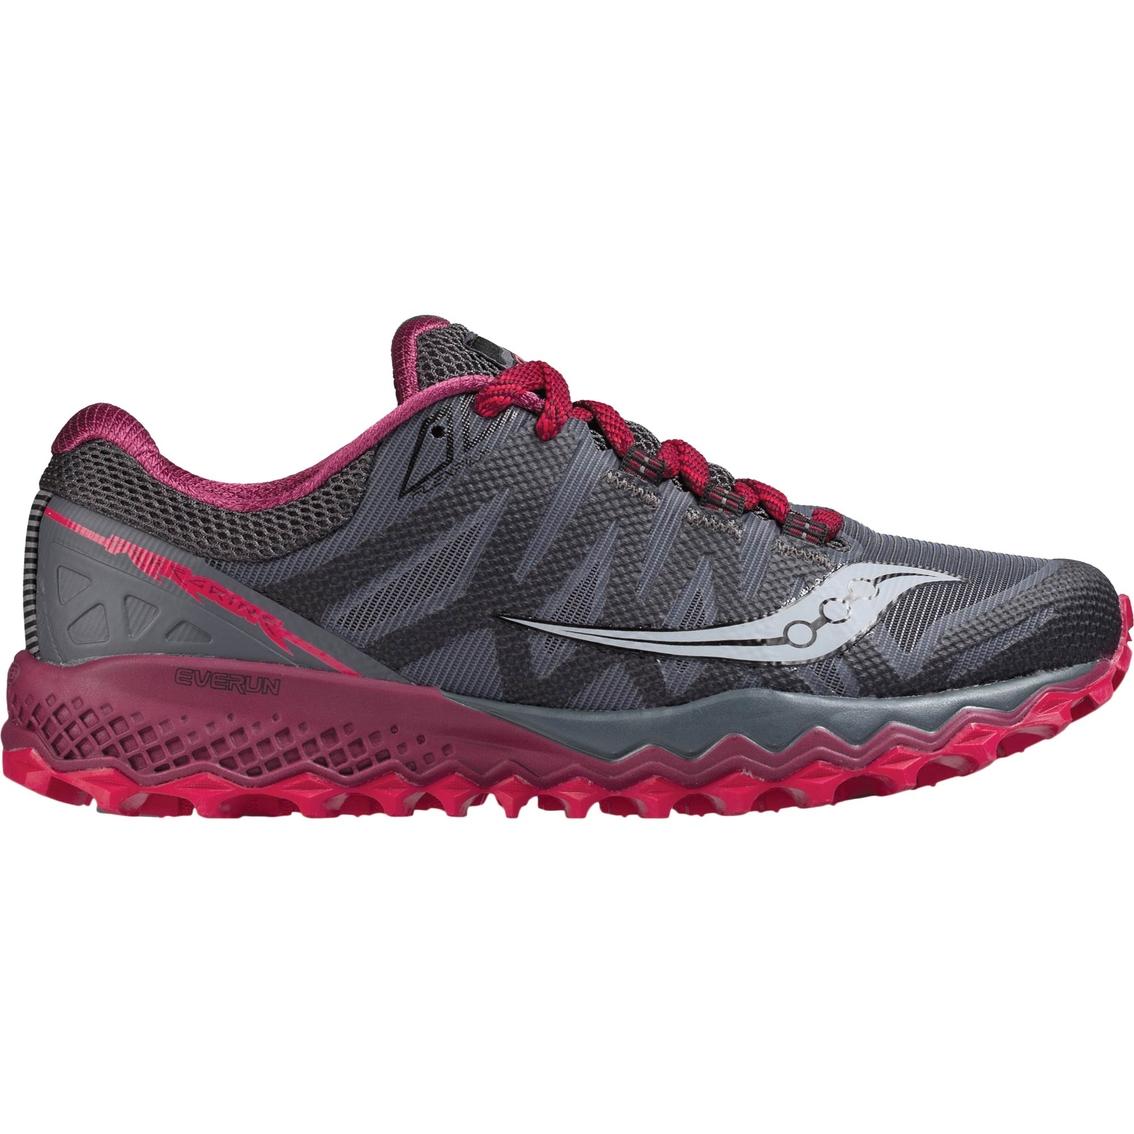 4a10b0dd86a5 Saucony Womens Peregrine 7 Trail Running Shoes